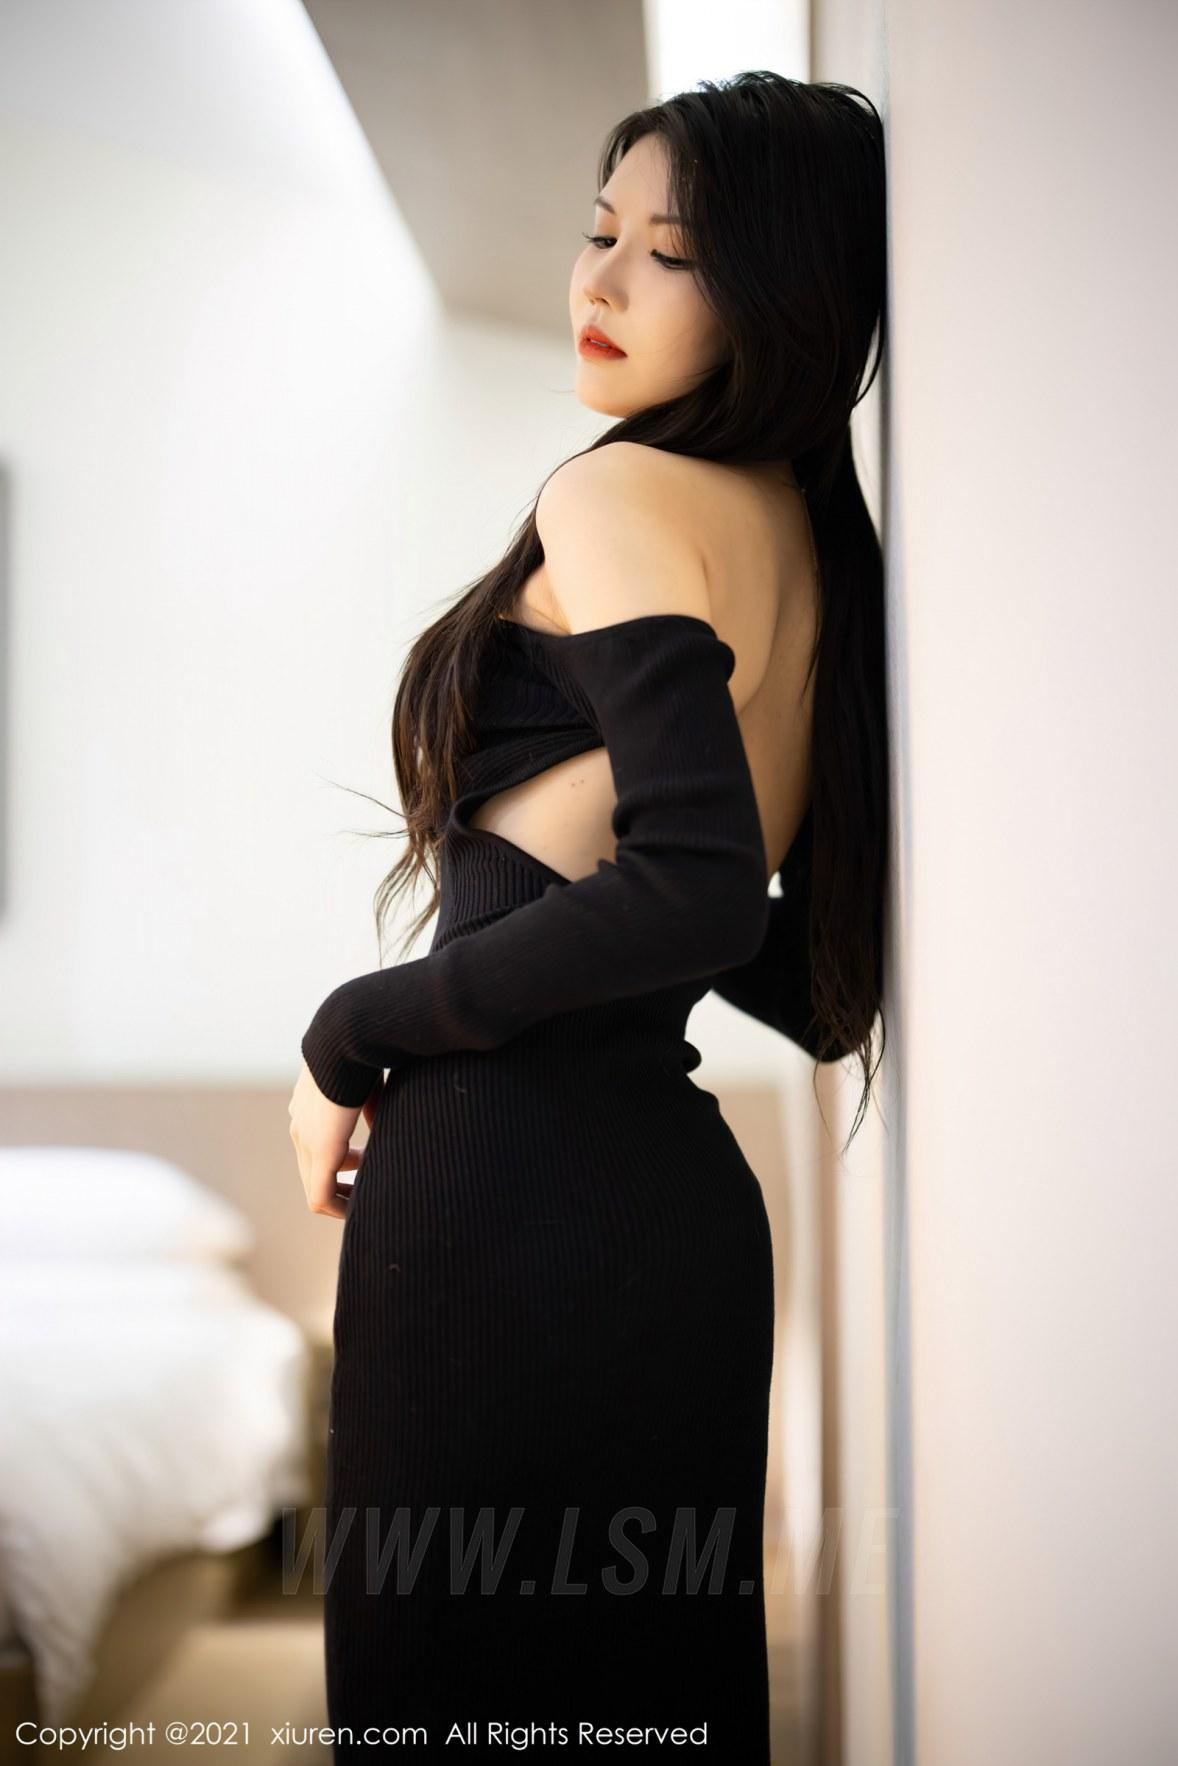 XiuRen 秀人 No.3822 新人模特 媛媛酱belle 杭州旅拍22 - 2